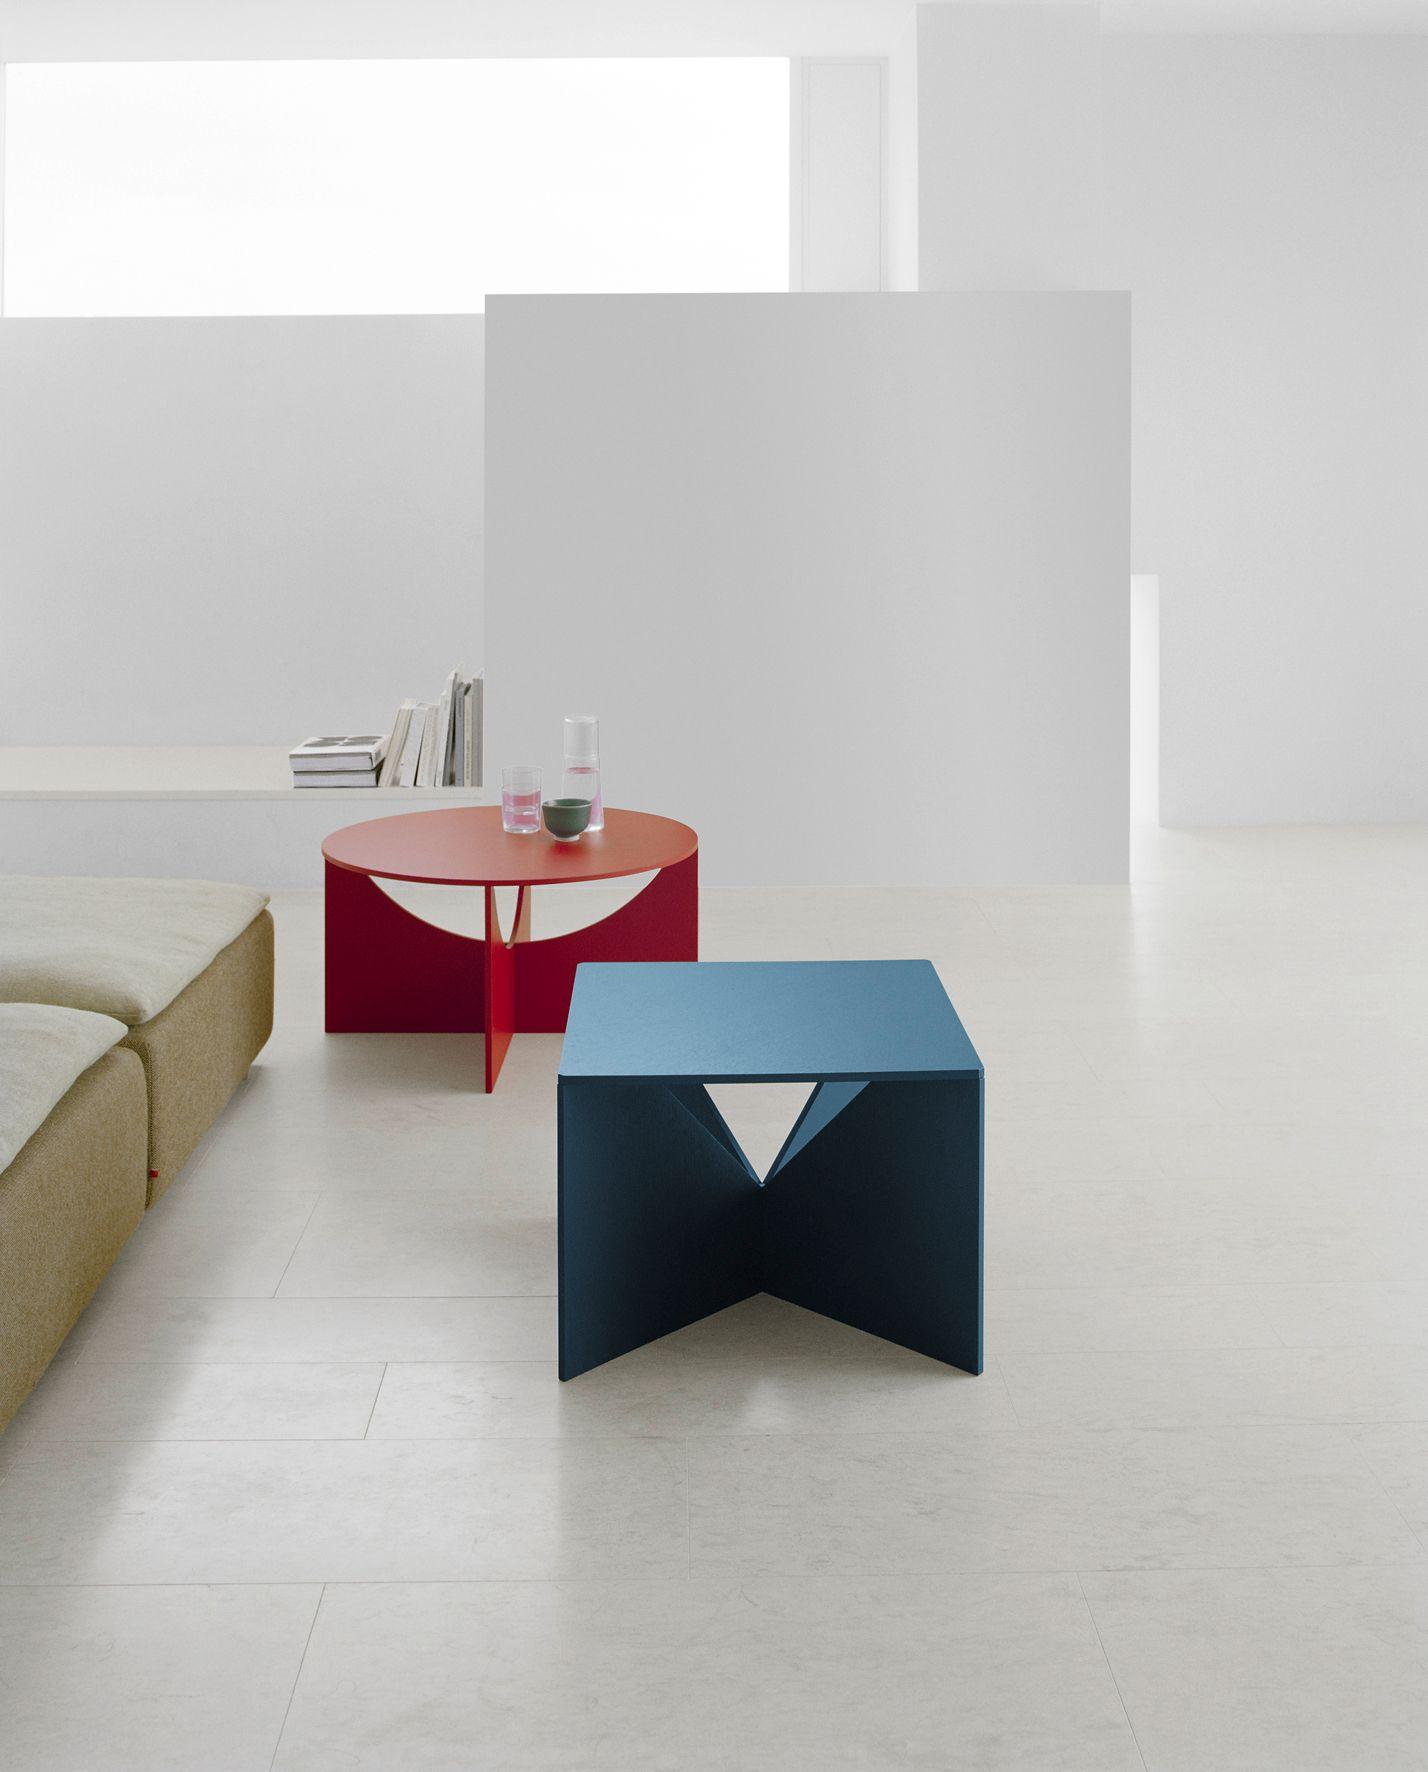 Coffee Table CALVERT by e15 design Ferdinand Kramer